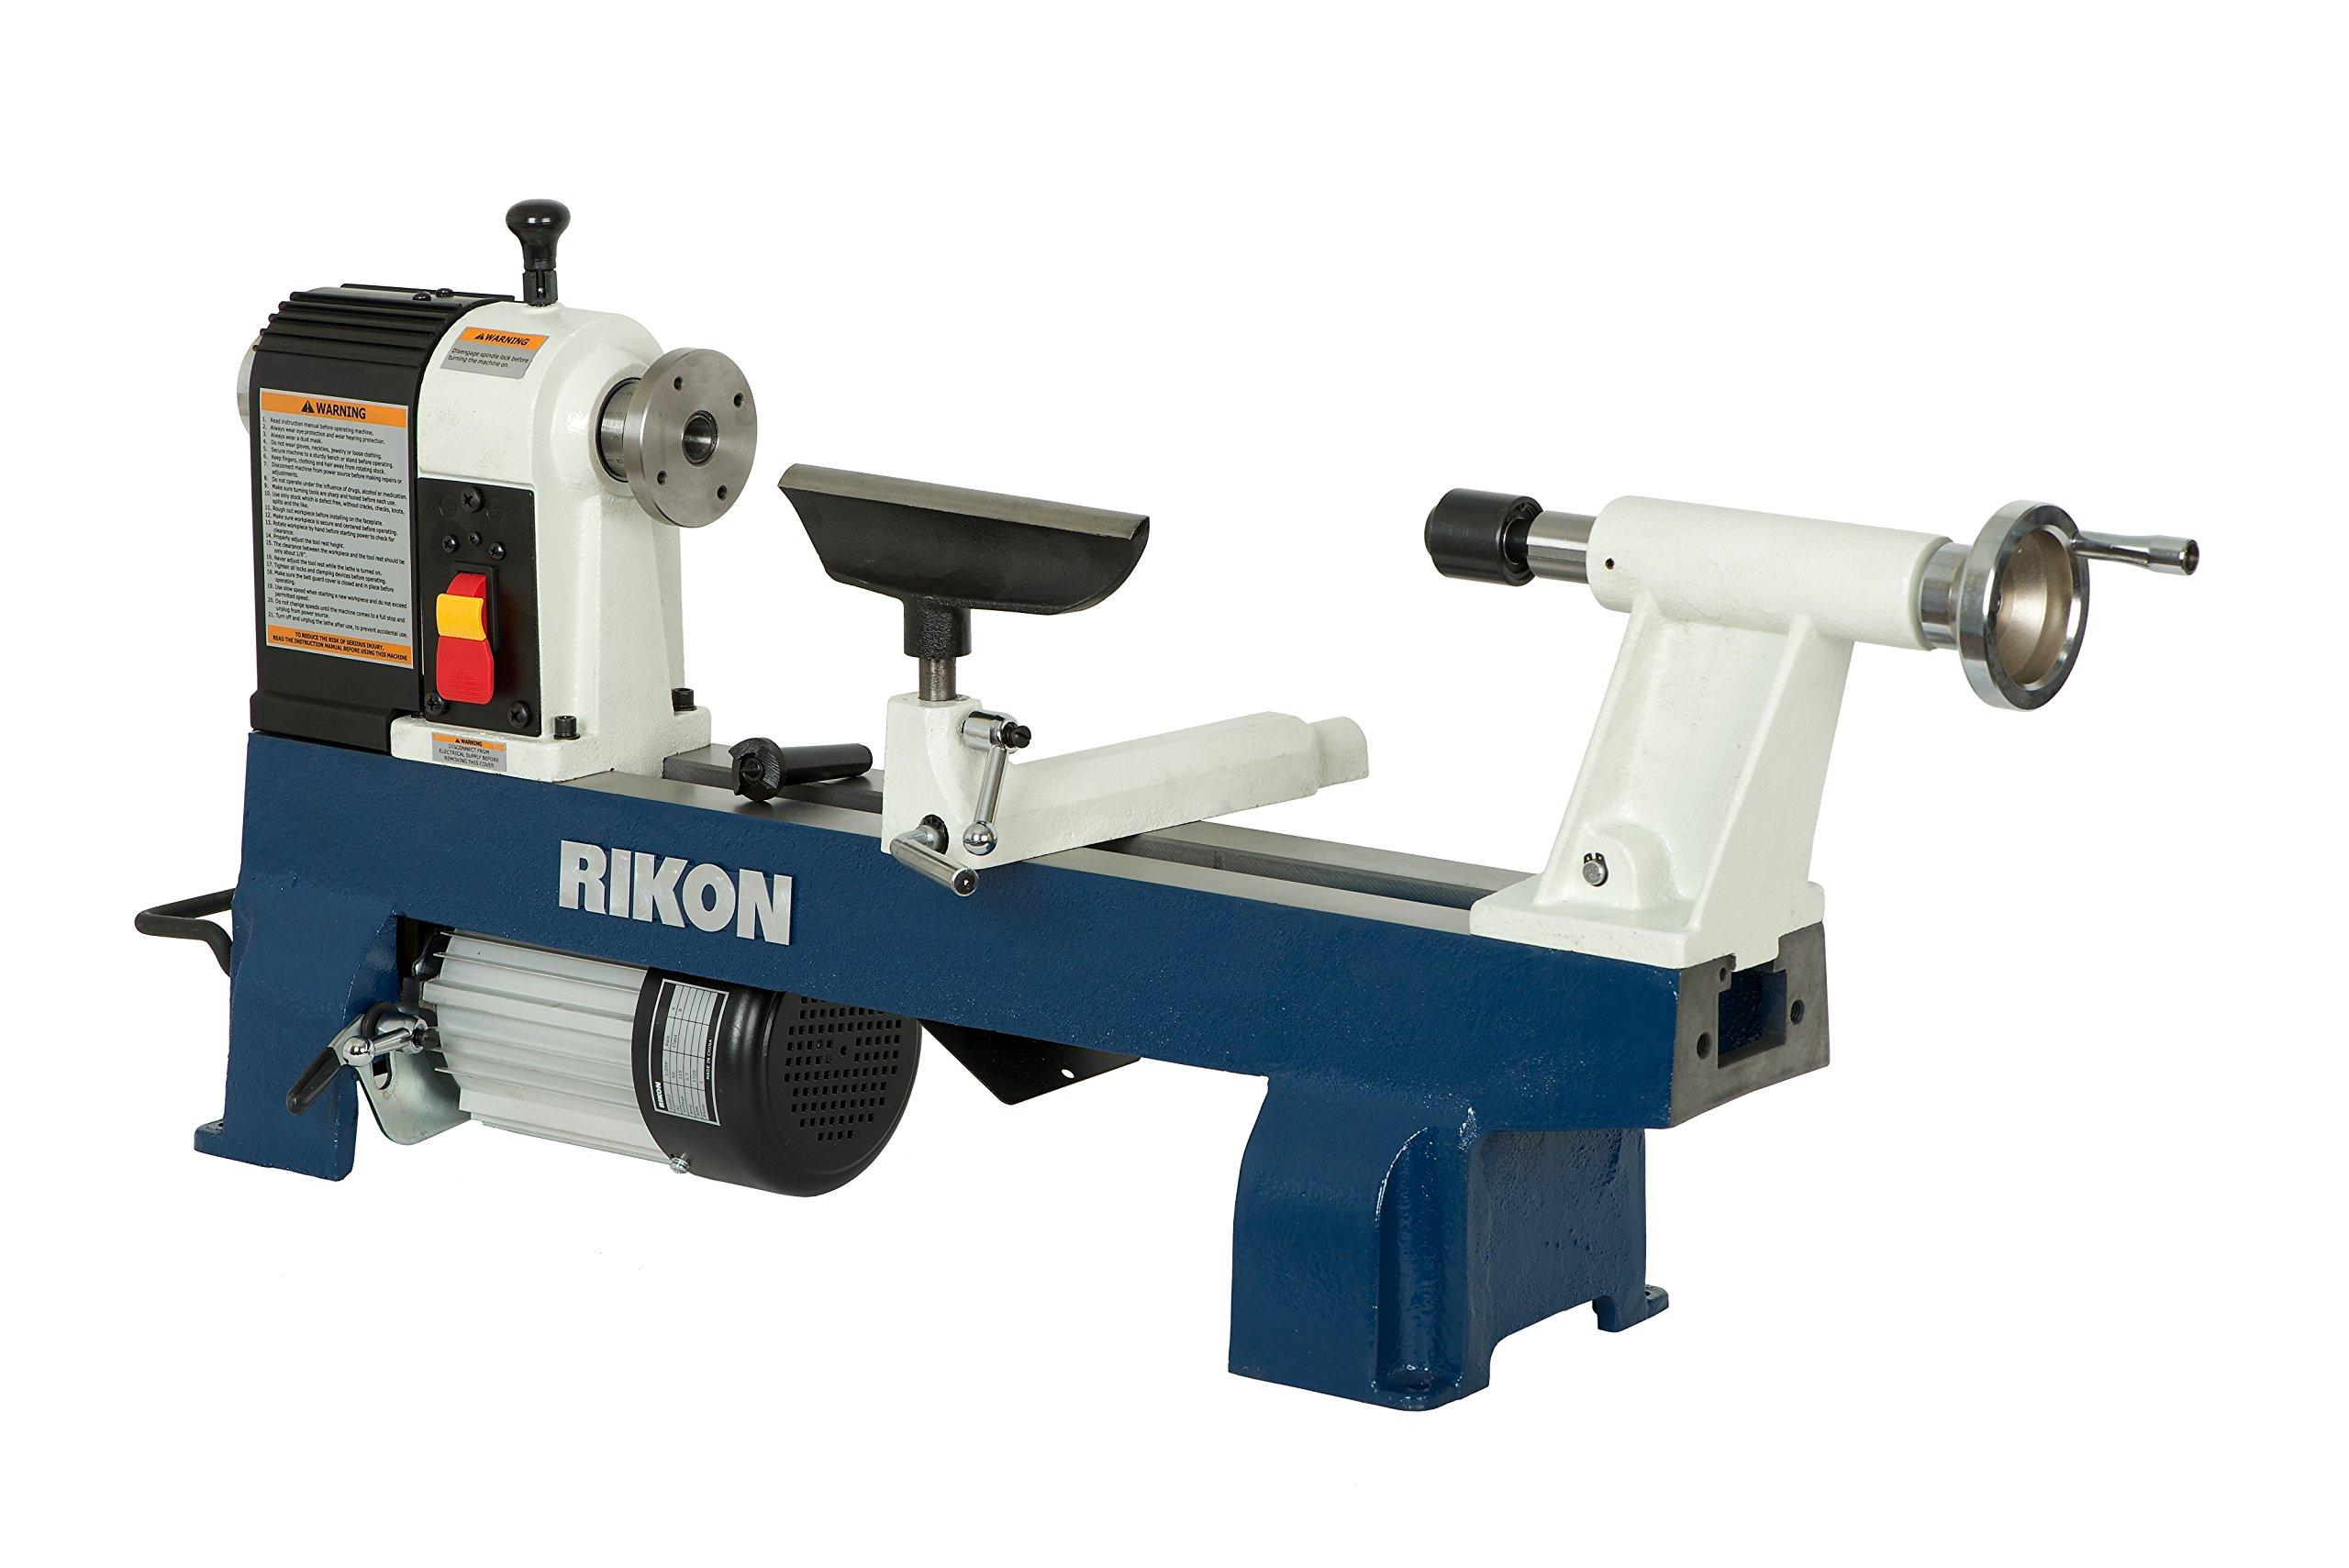 RIKON 70-100 12-by-16-Inch Mini wood Lathe